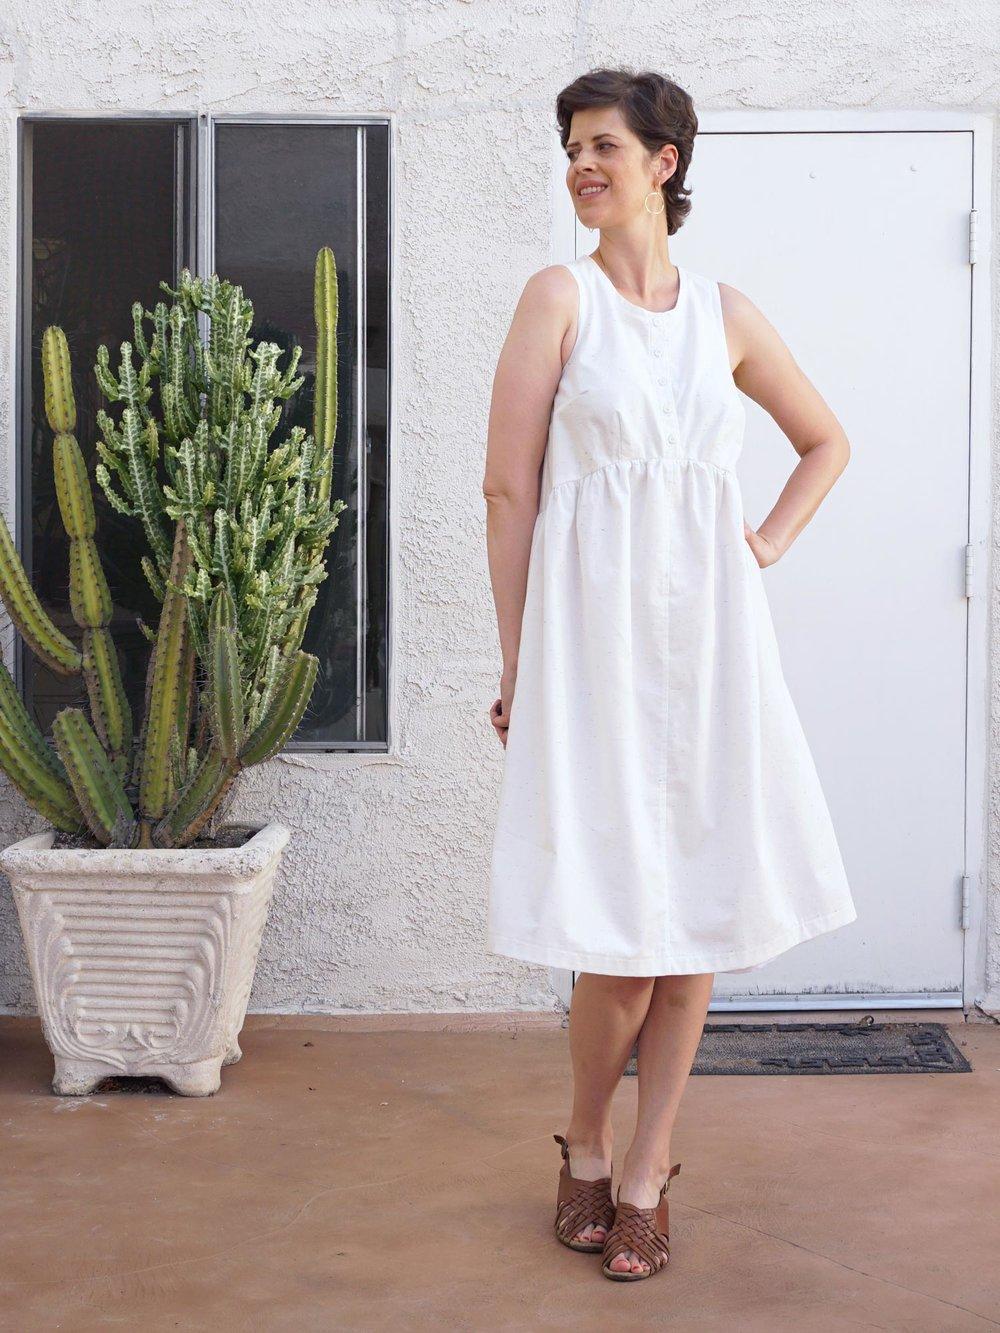 DIY White Summer Lisa Dress | Sew DIY